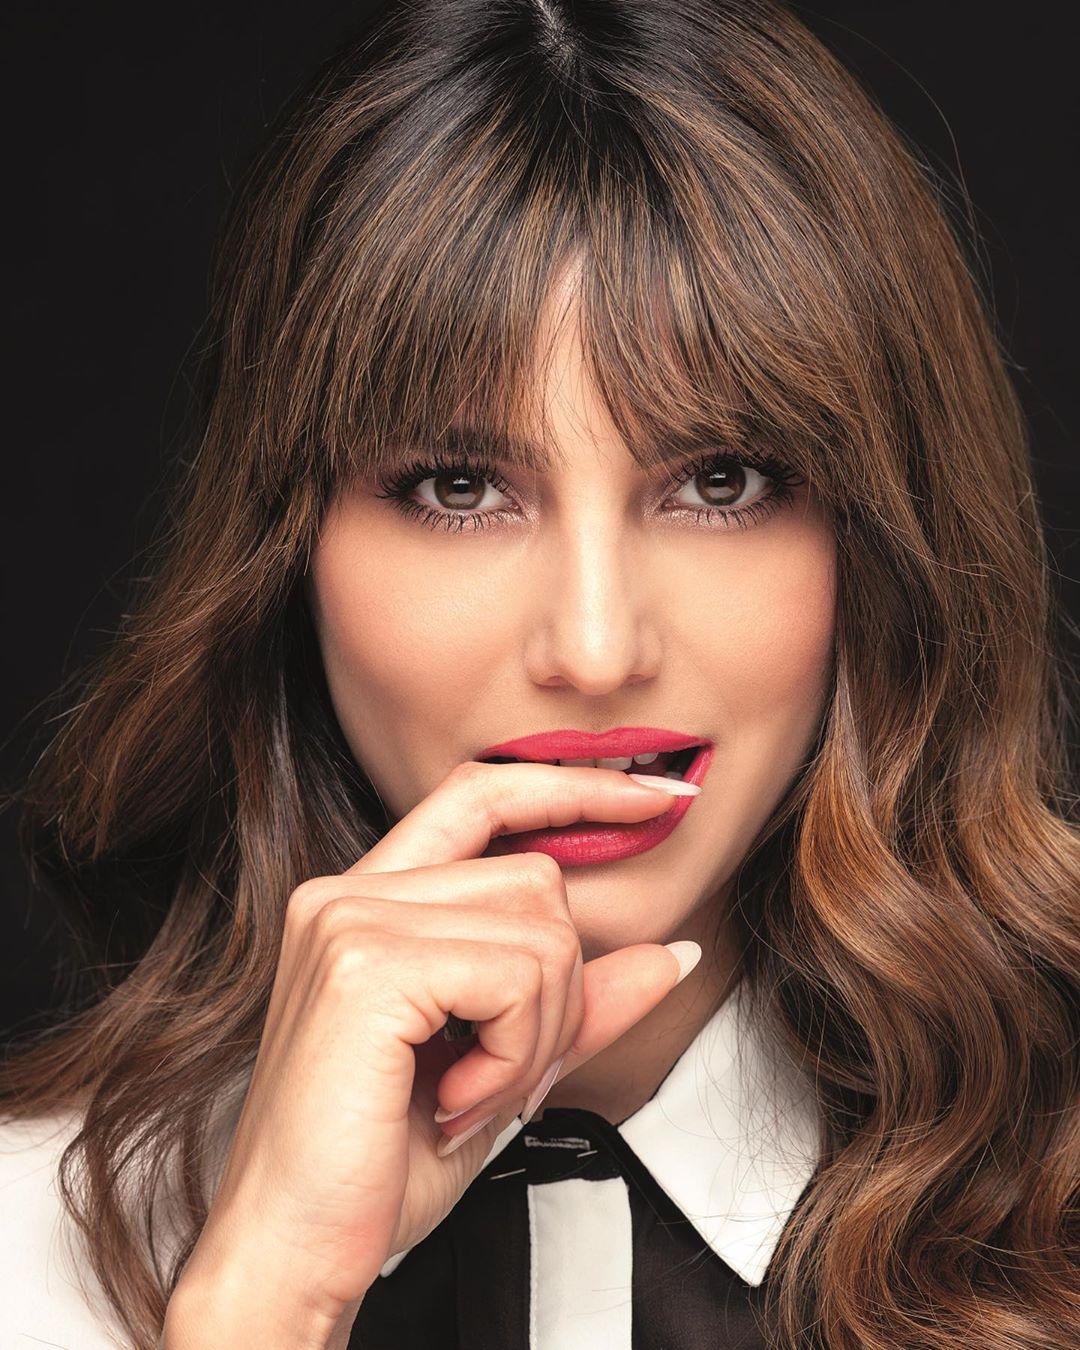 Iliana-Papageorgiou-Wallpapers-Insta-Fit-Bio-1